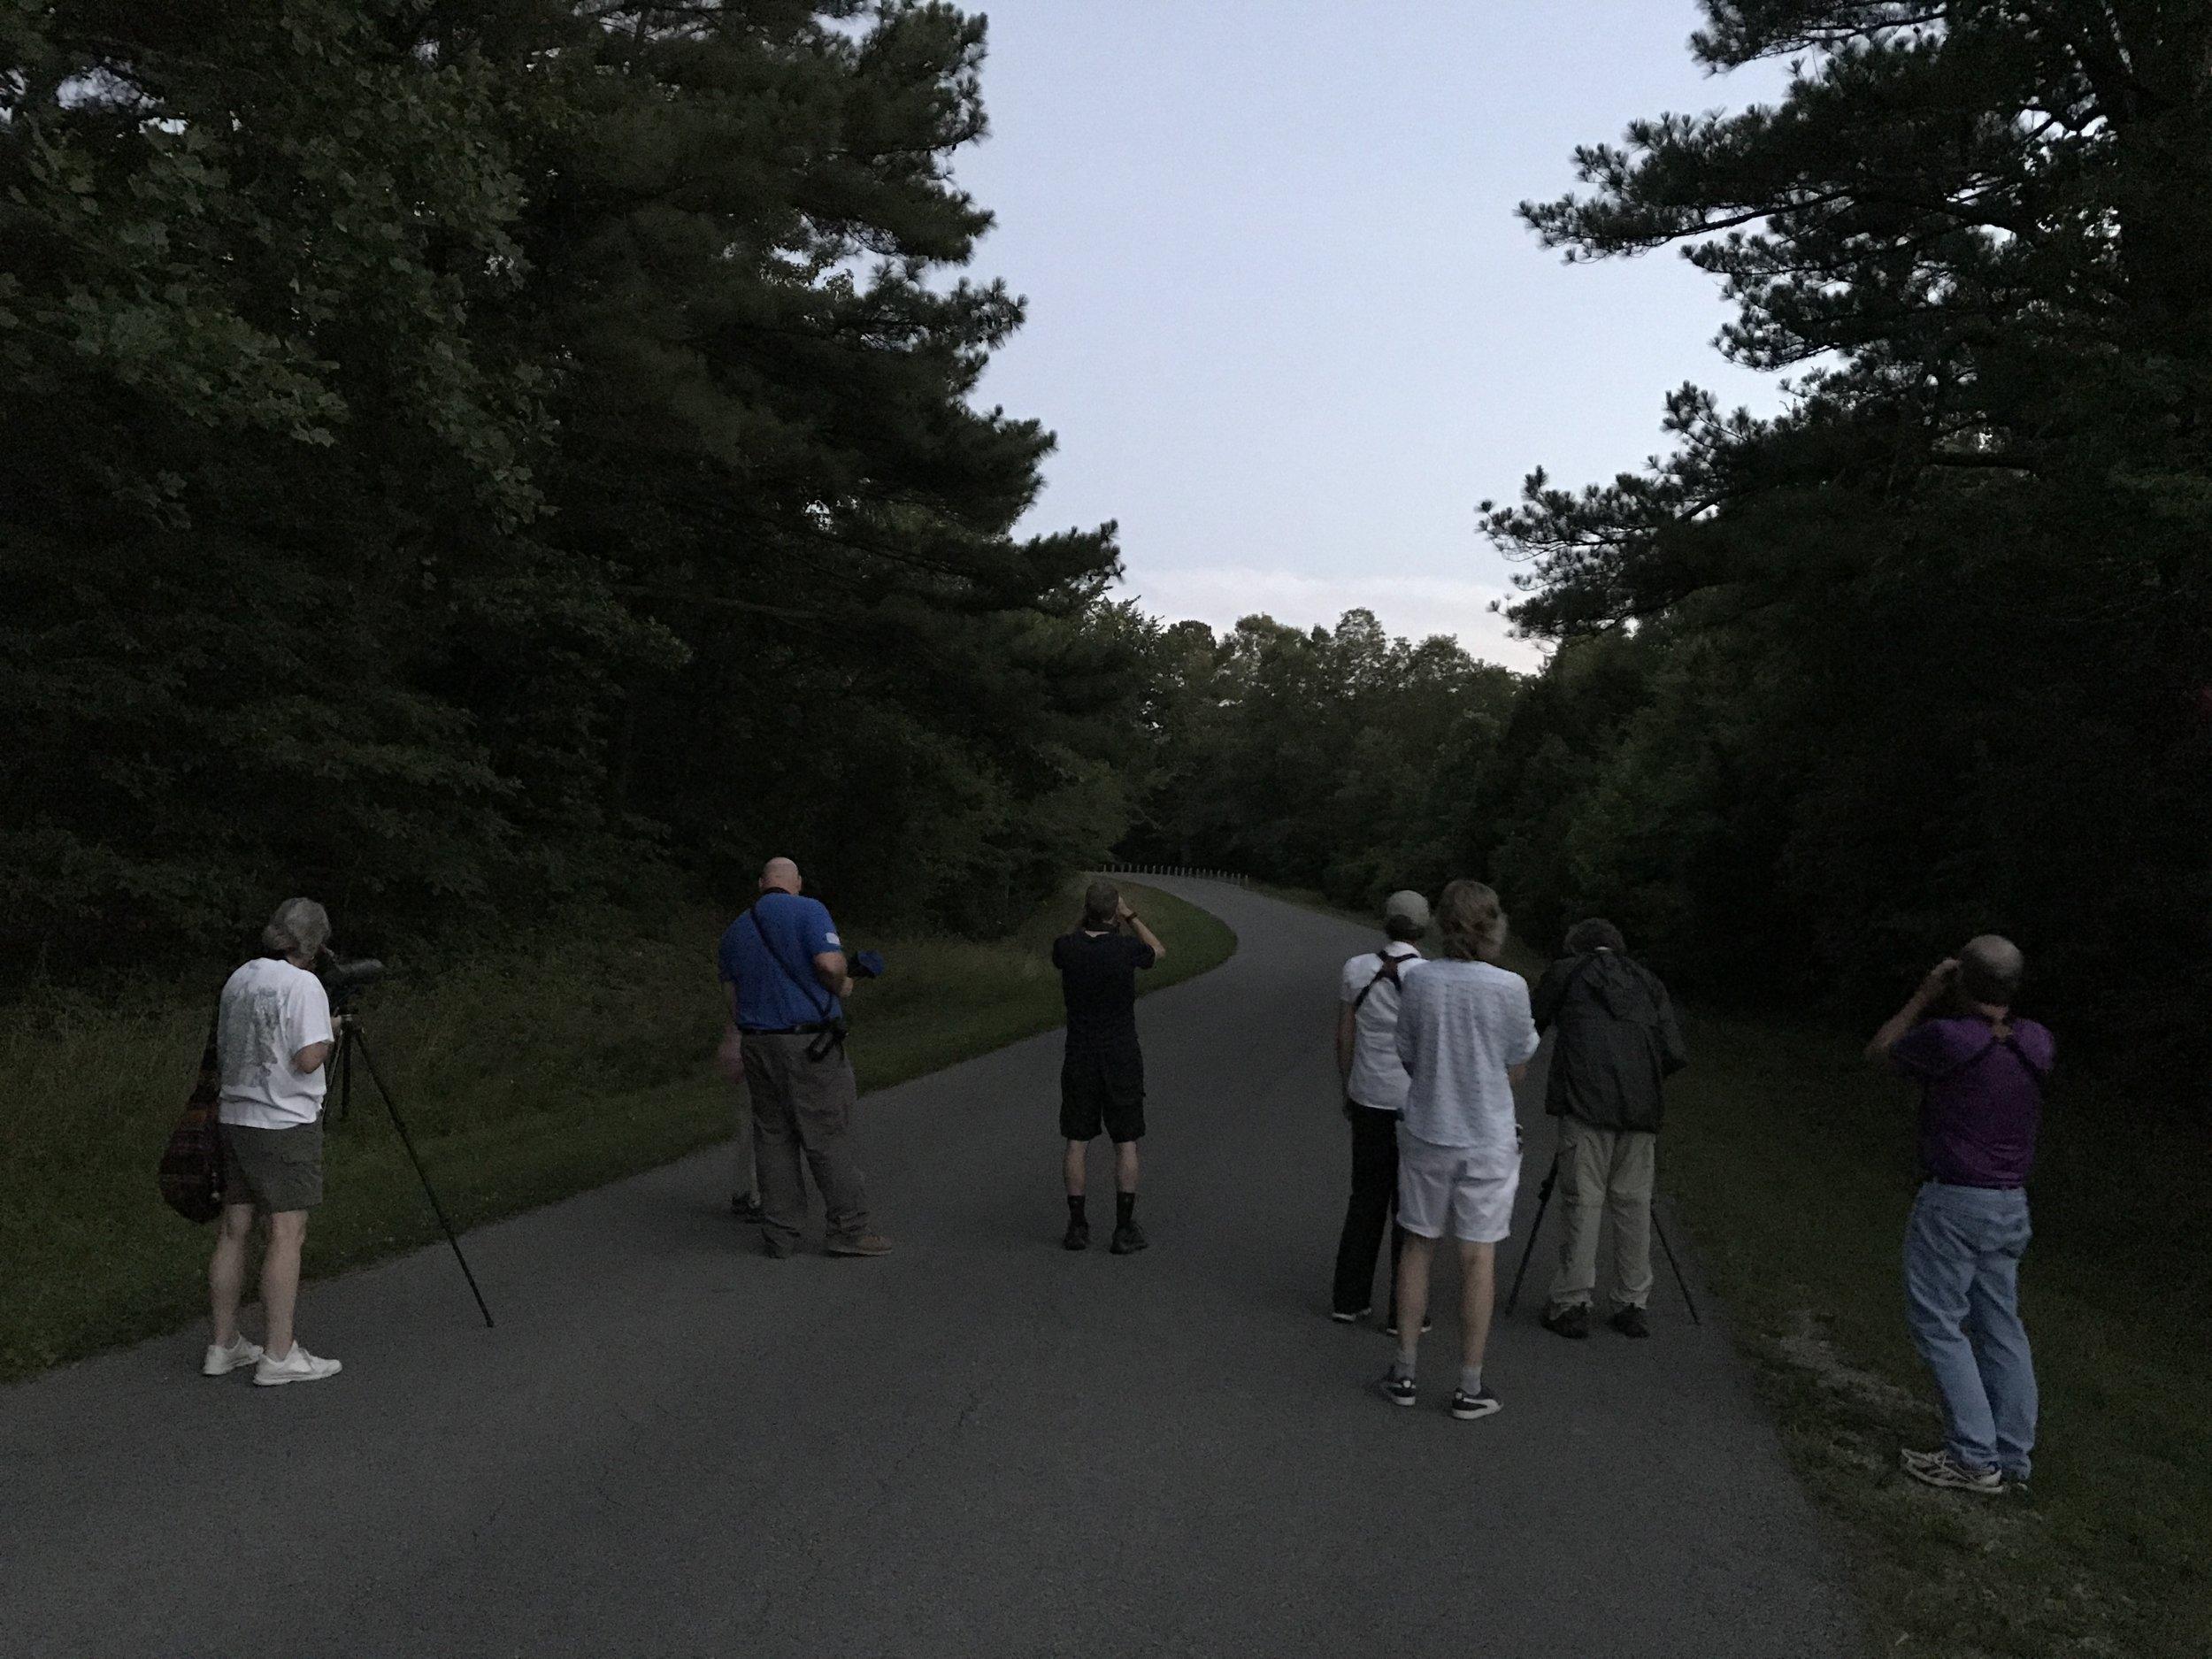 Night birding at Fern Clyffe